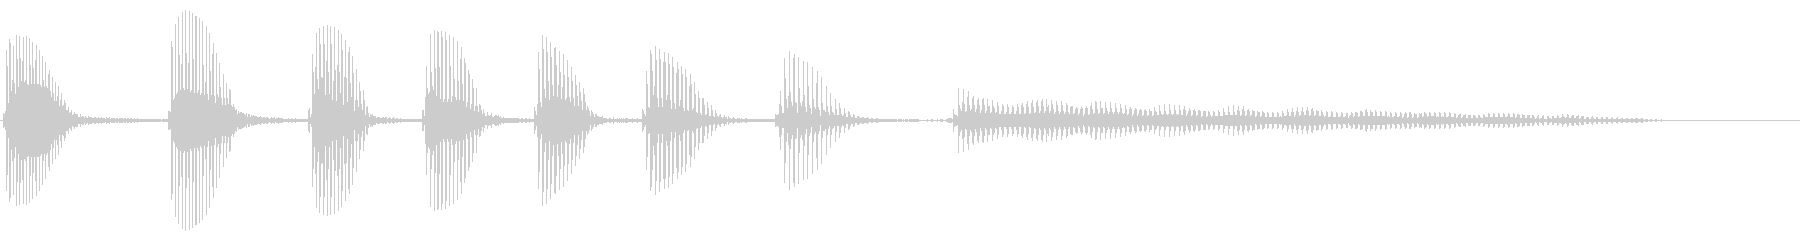 BASSOON:スローウォークダウ...の未再生の波形